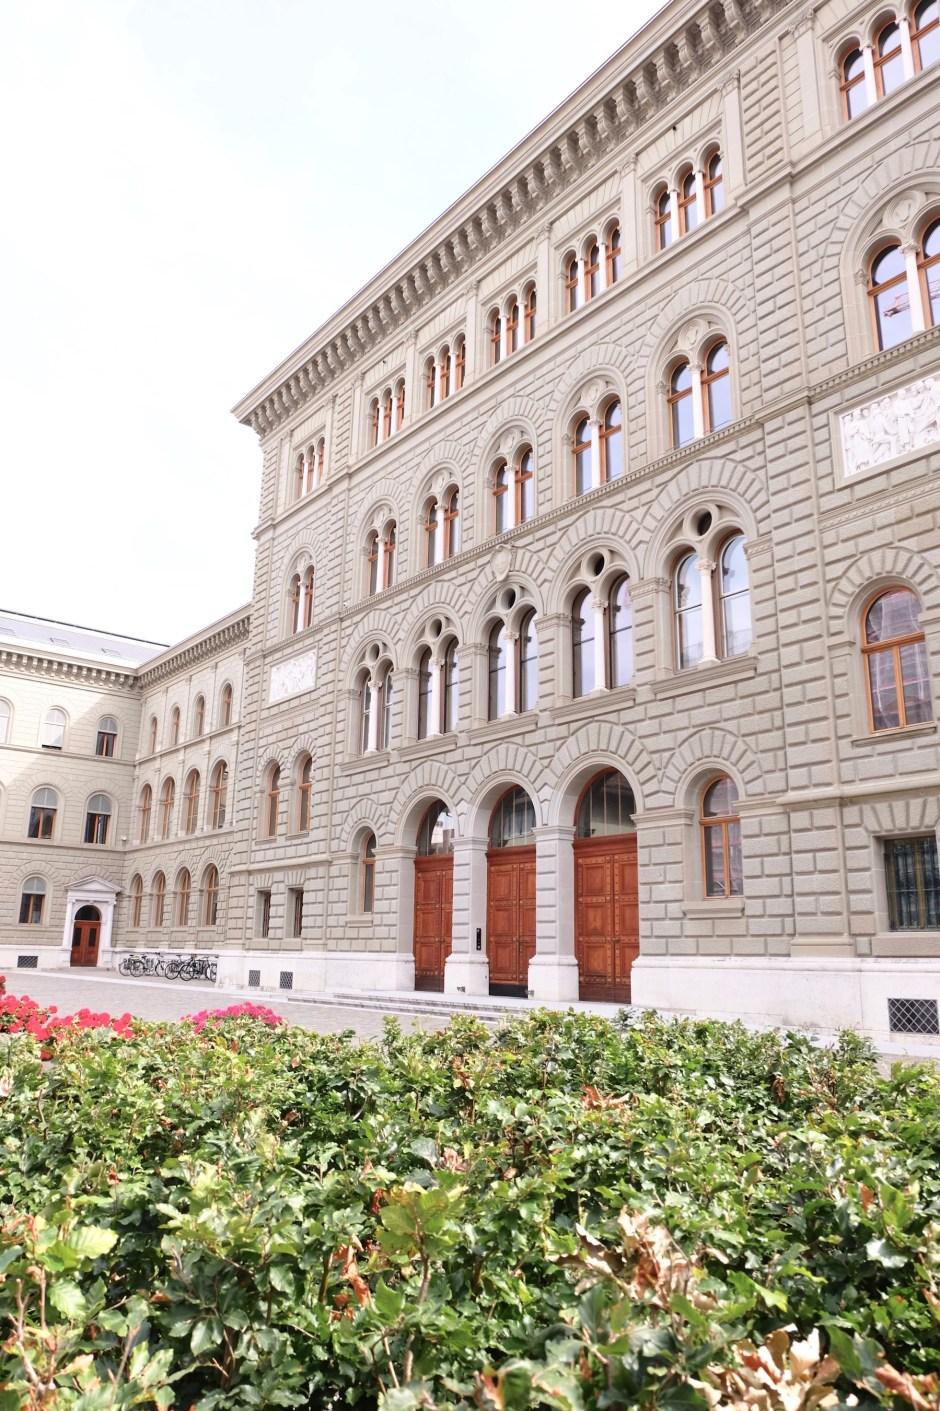 Bern Building